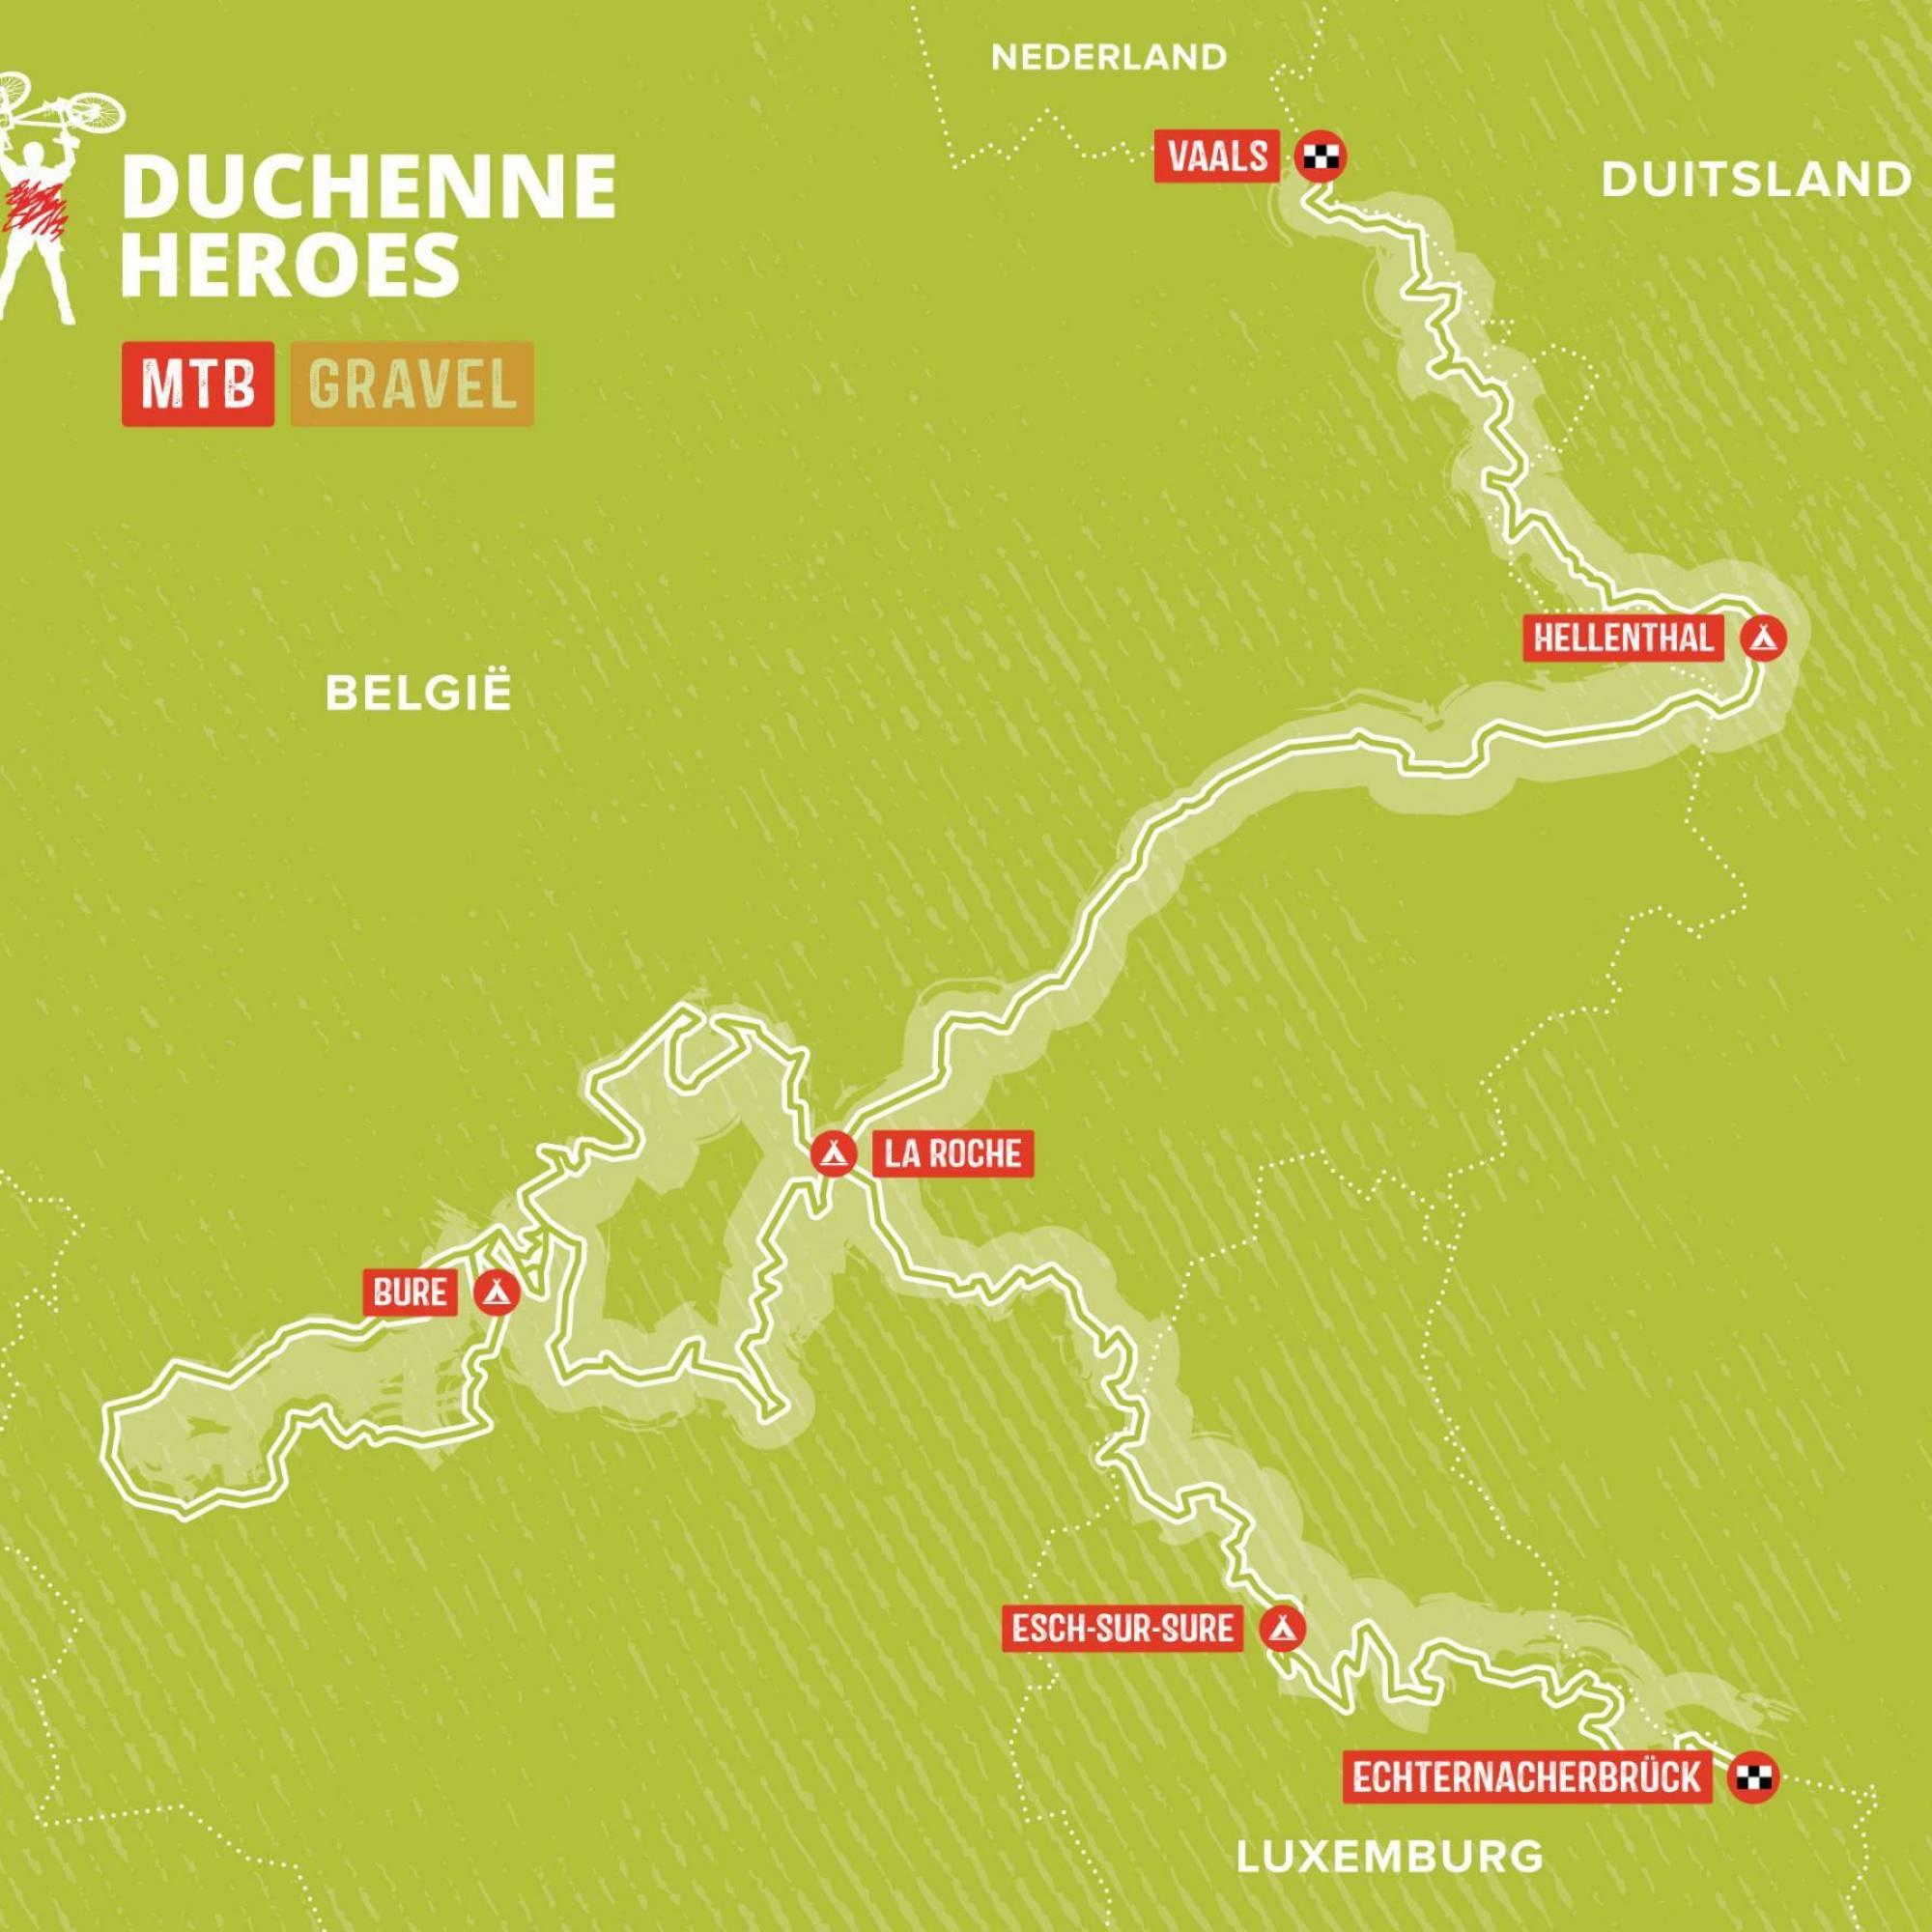 Mountainbike Route Duchenne Heroes